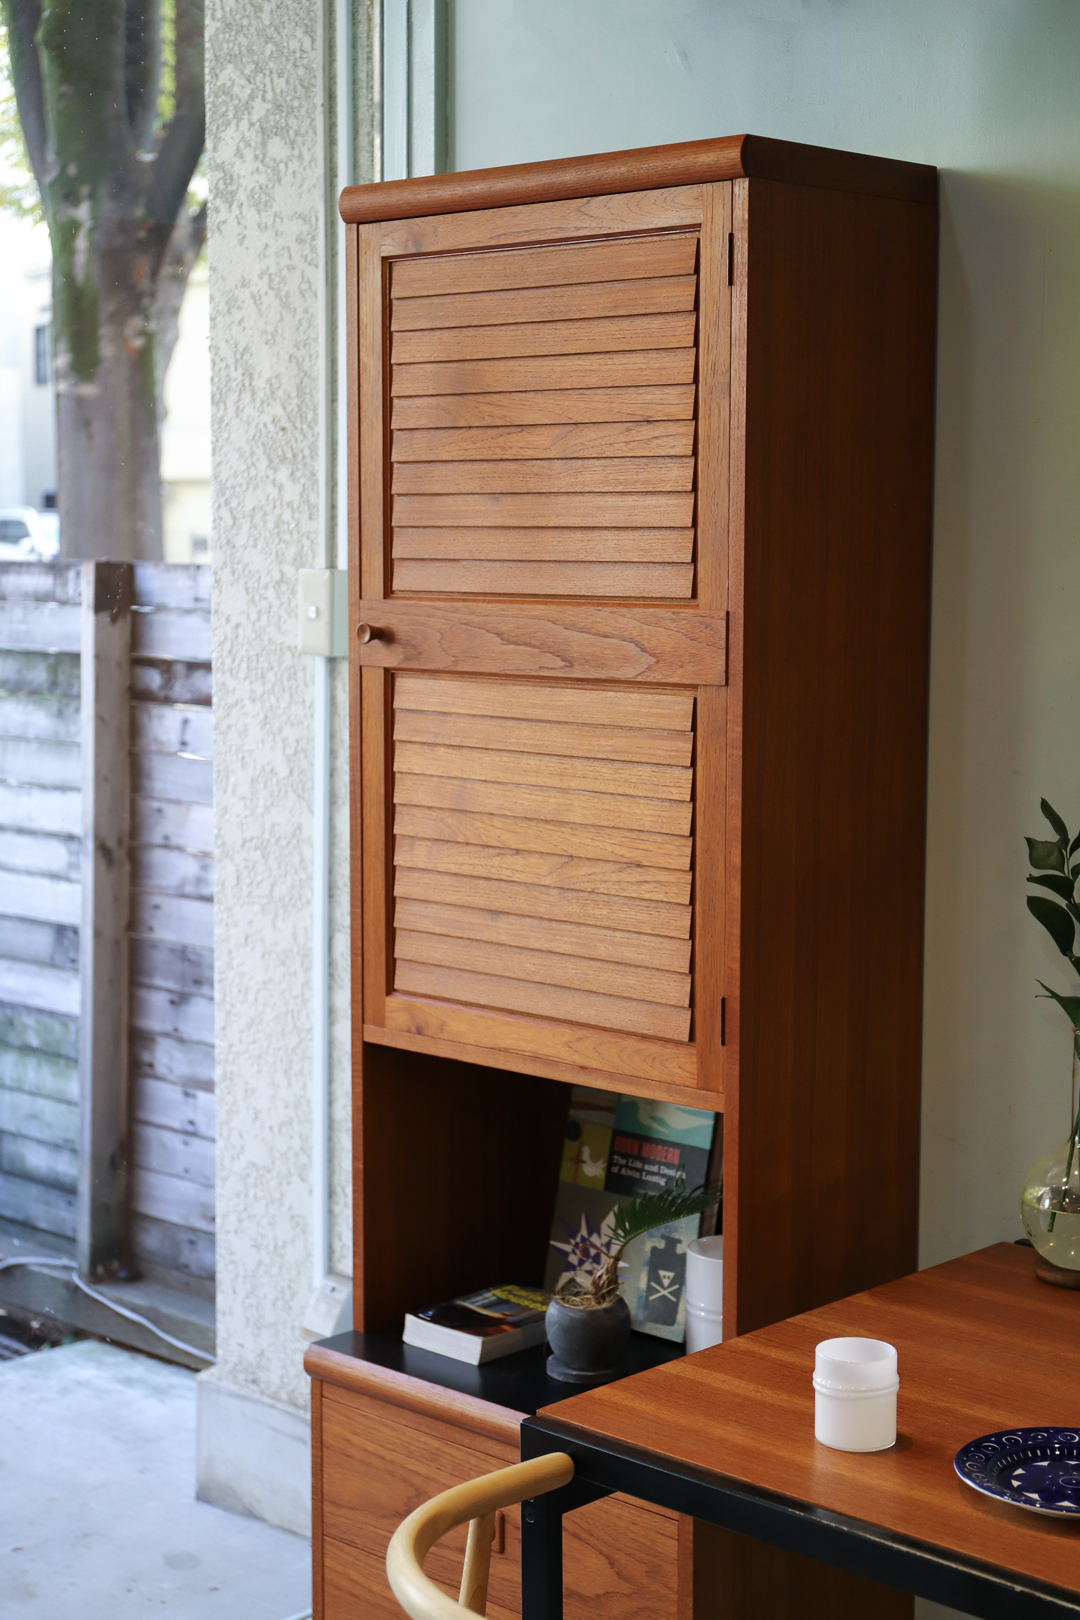 Japanese Vintage Teakwood Cabinet Chest/ジャパンヴィンテージ キャビネット チェスト 本棚 チーク材 レトロモダン